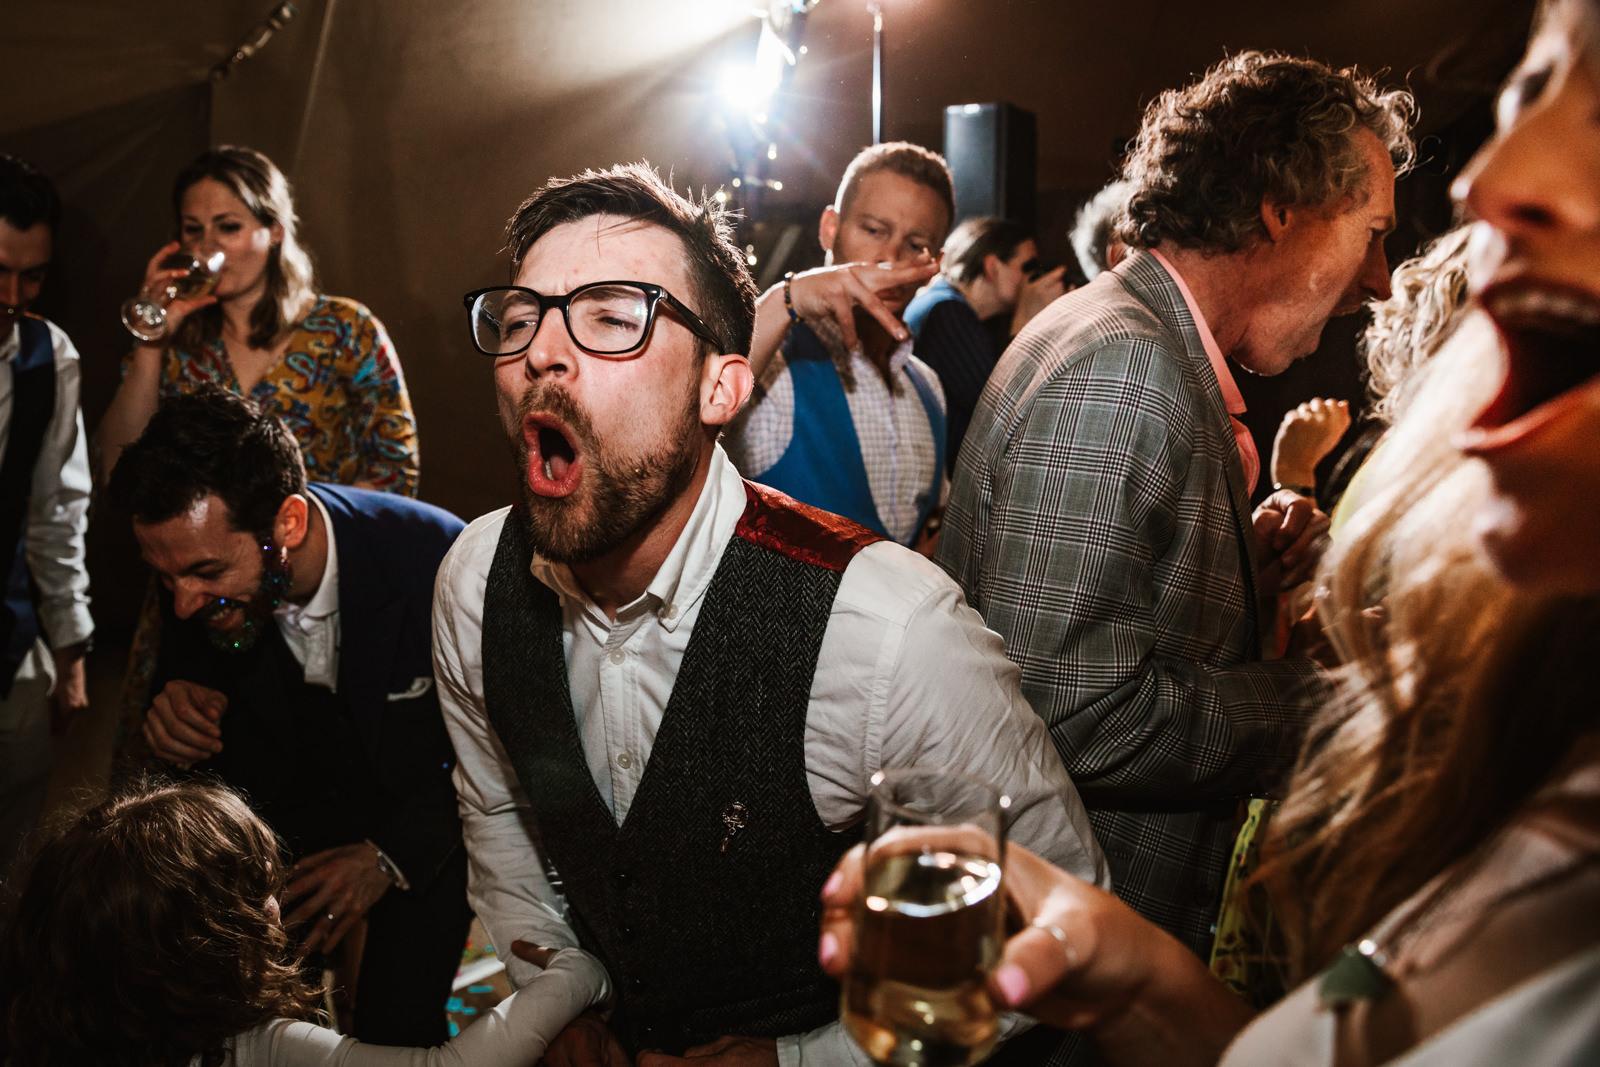 wild wedding party